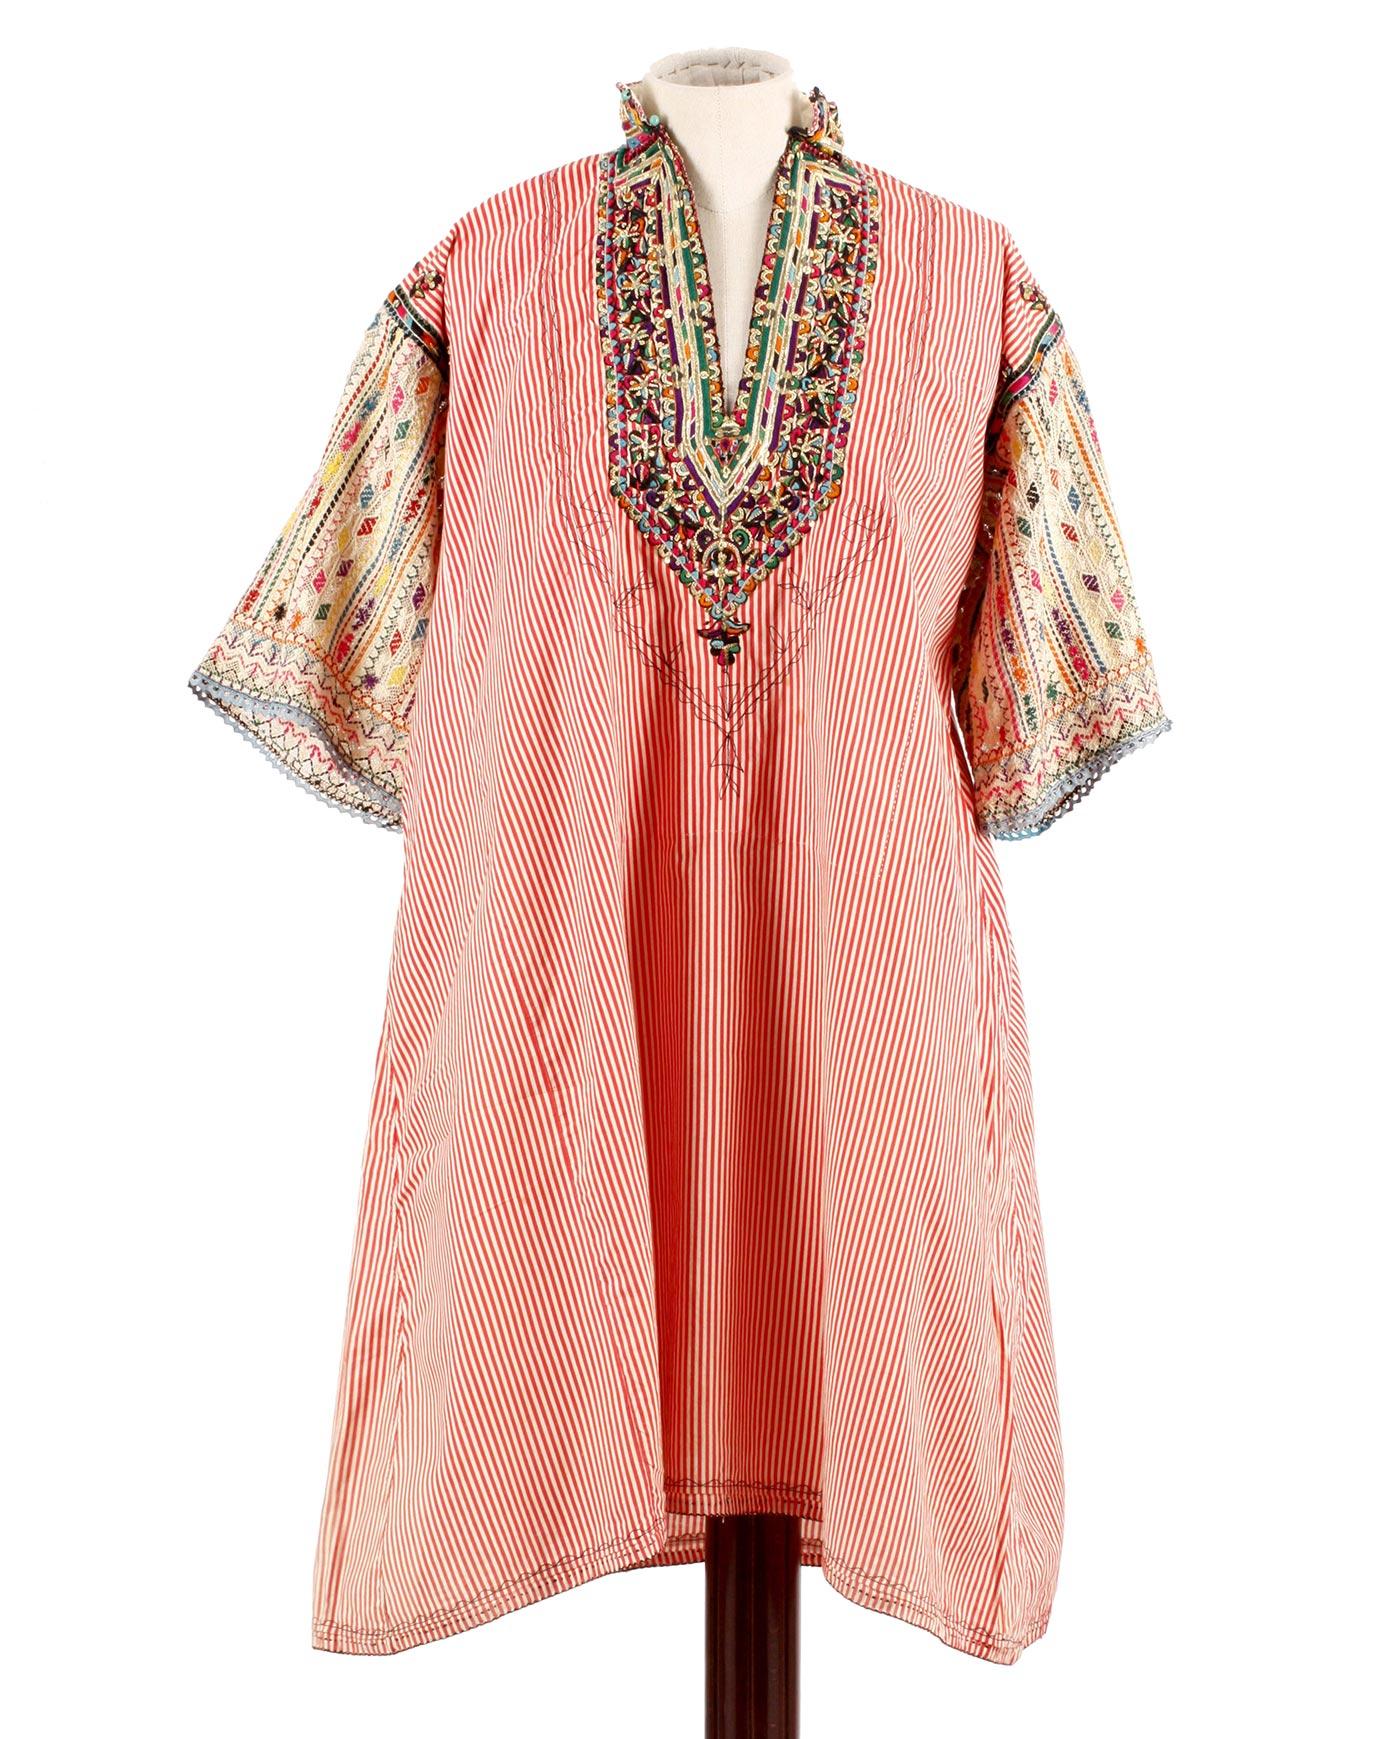 Ethnic vintage Ceremonial dress of Tunisia